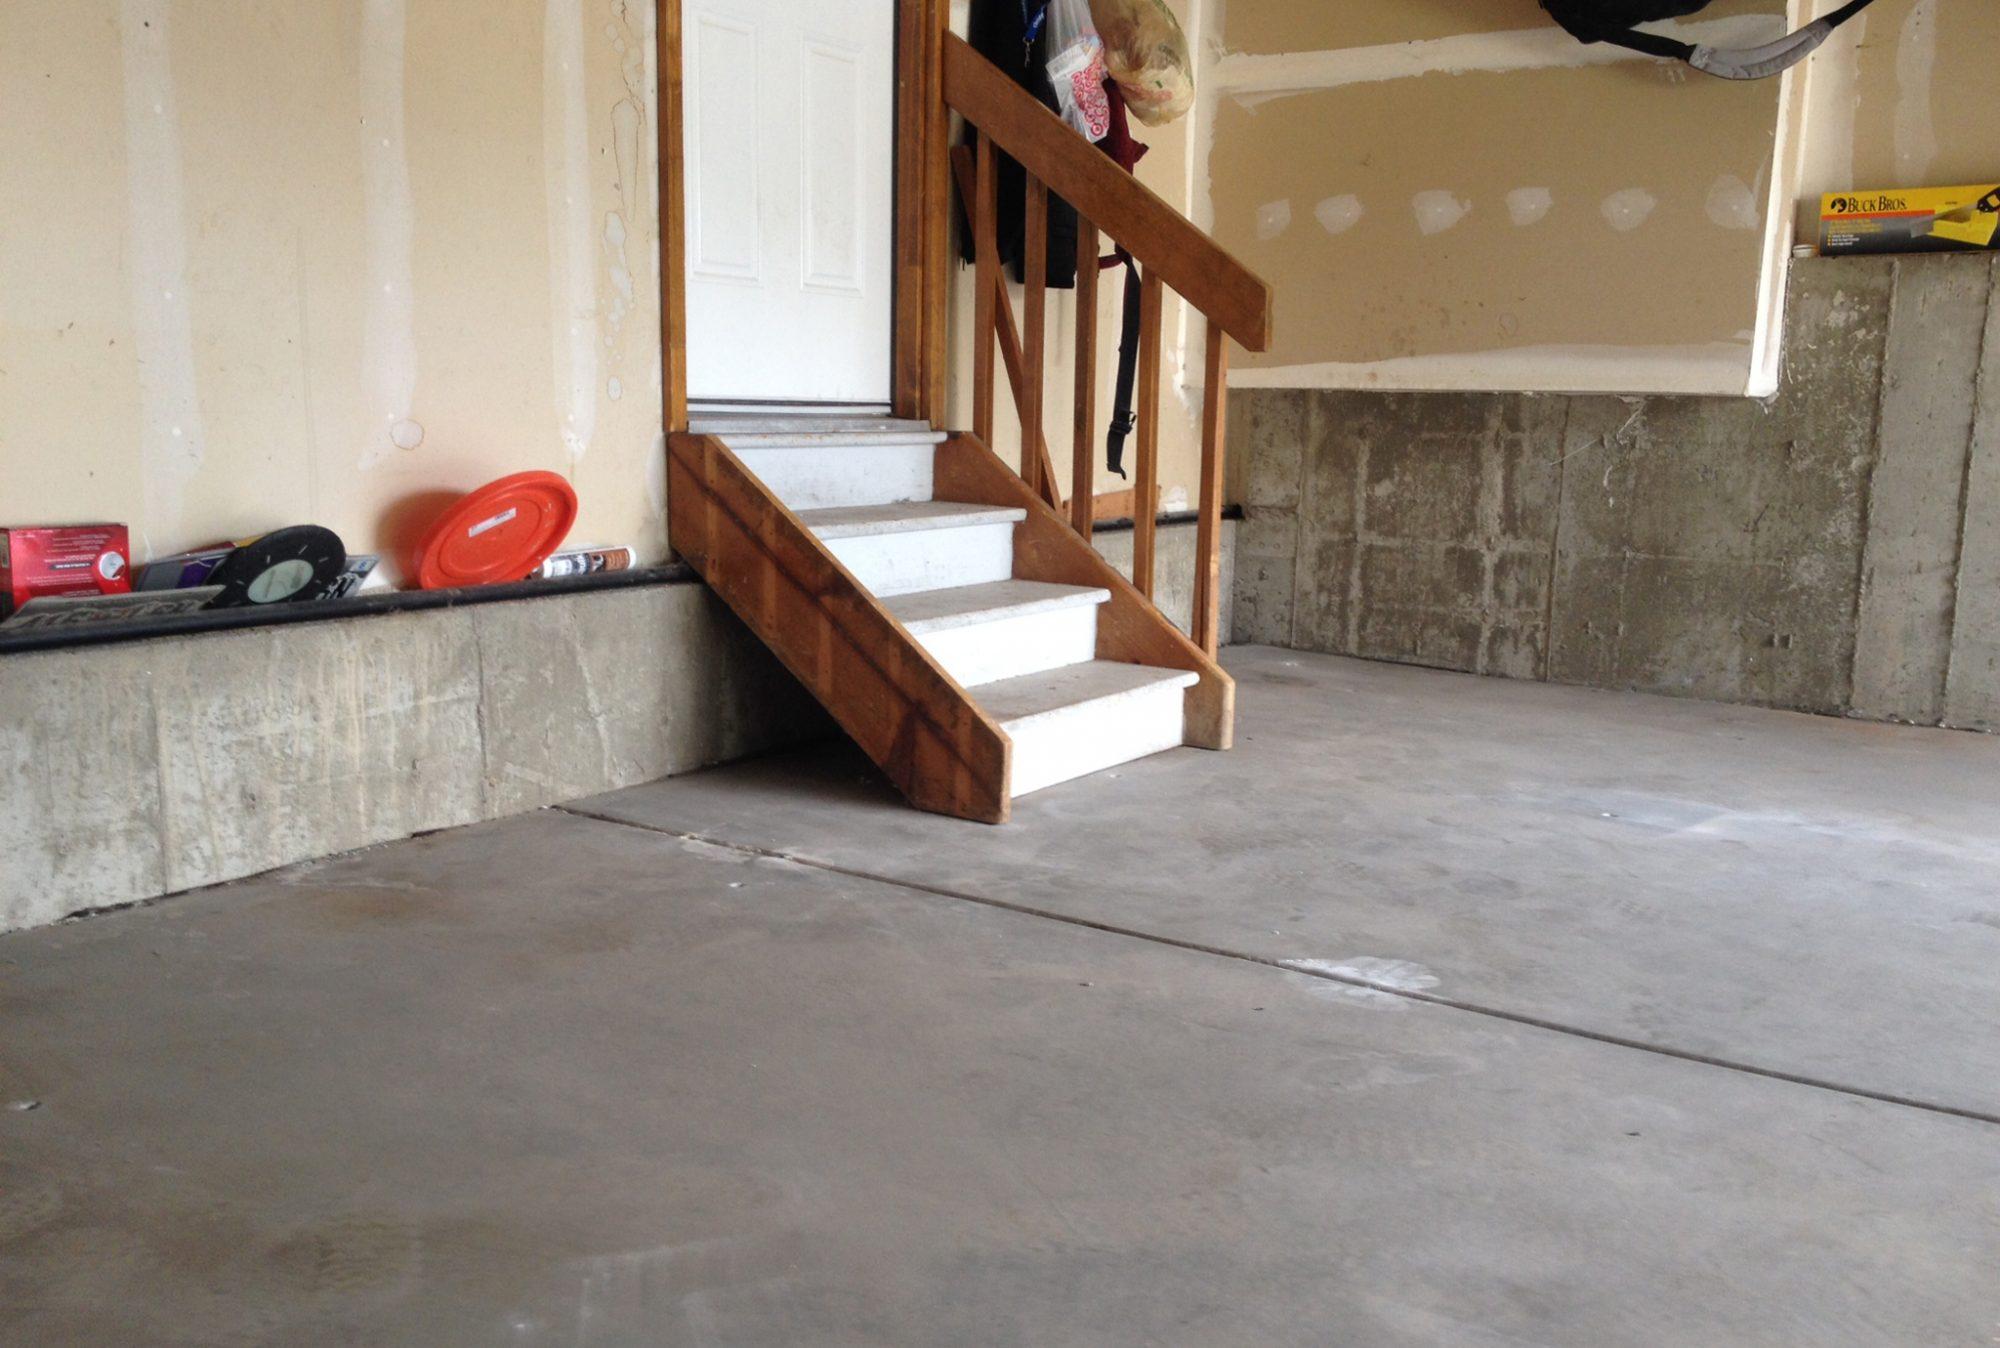 Garage floor after Liftech concrete raising